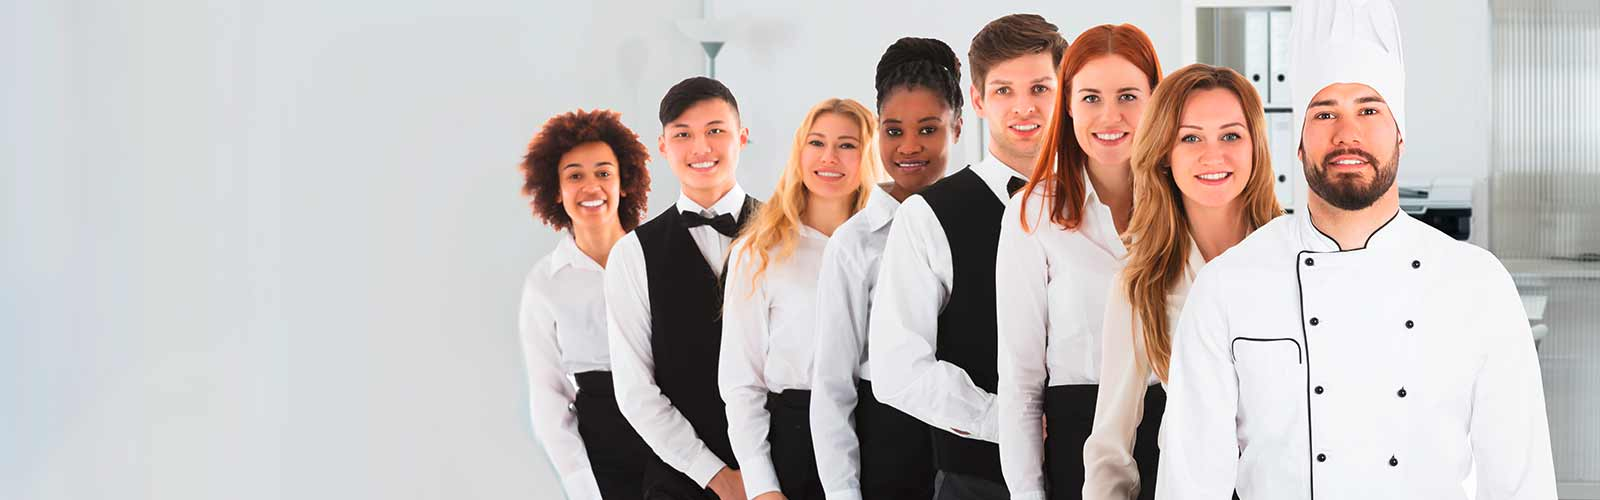 Smiling Customer - Engagierte Hotelmitarbeiter